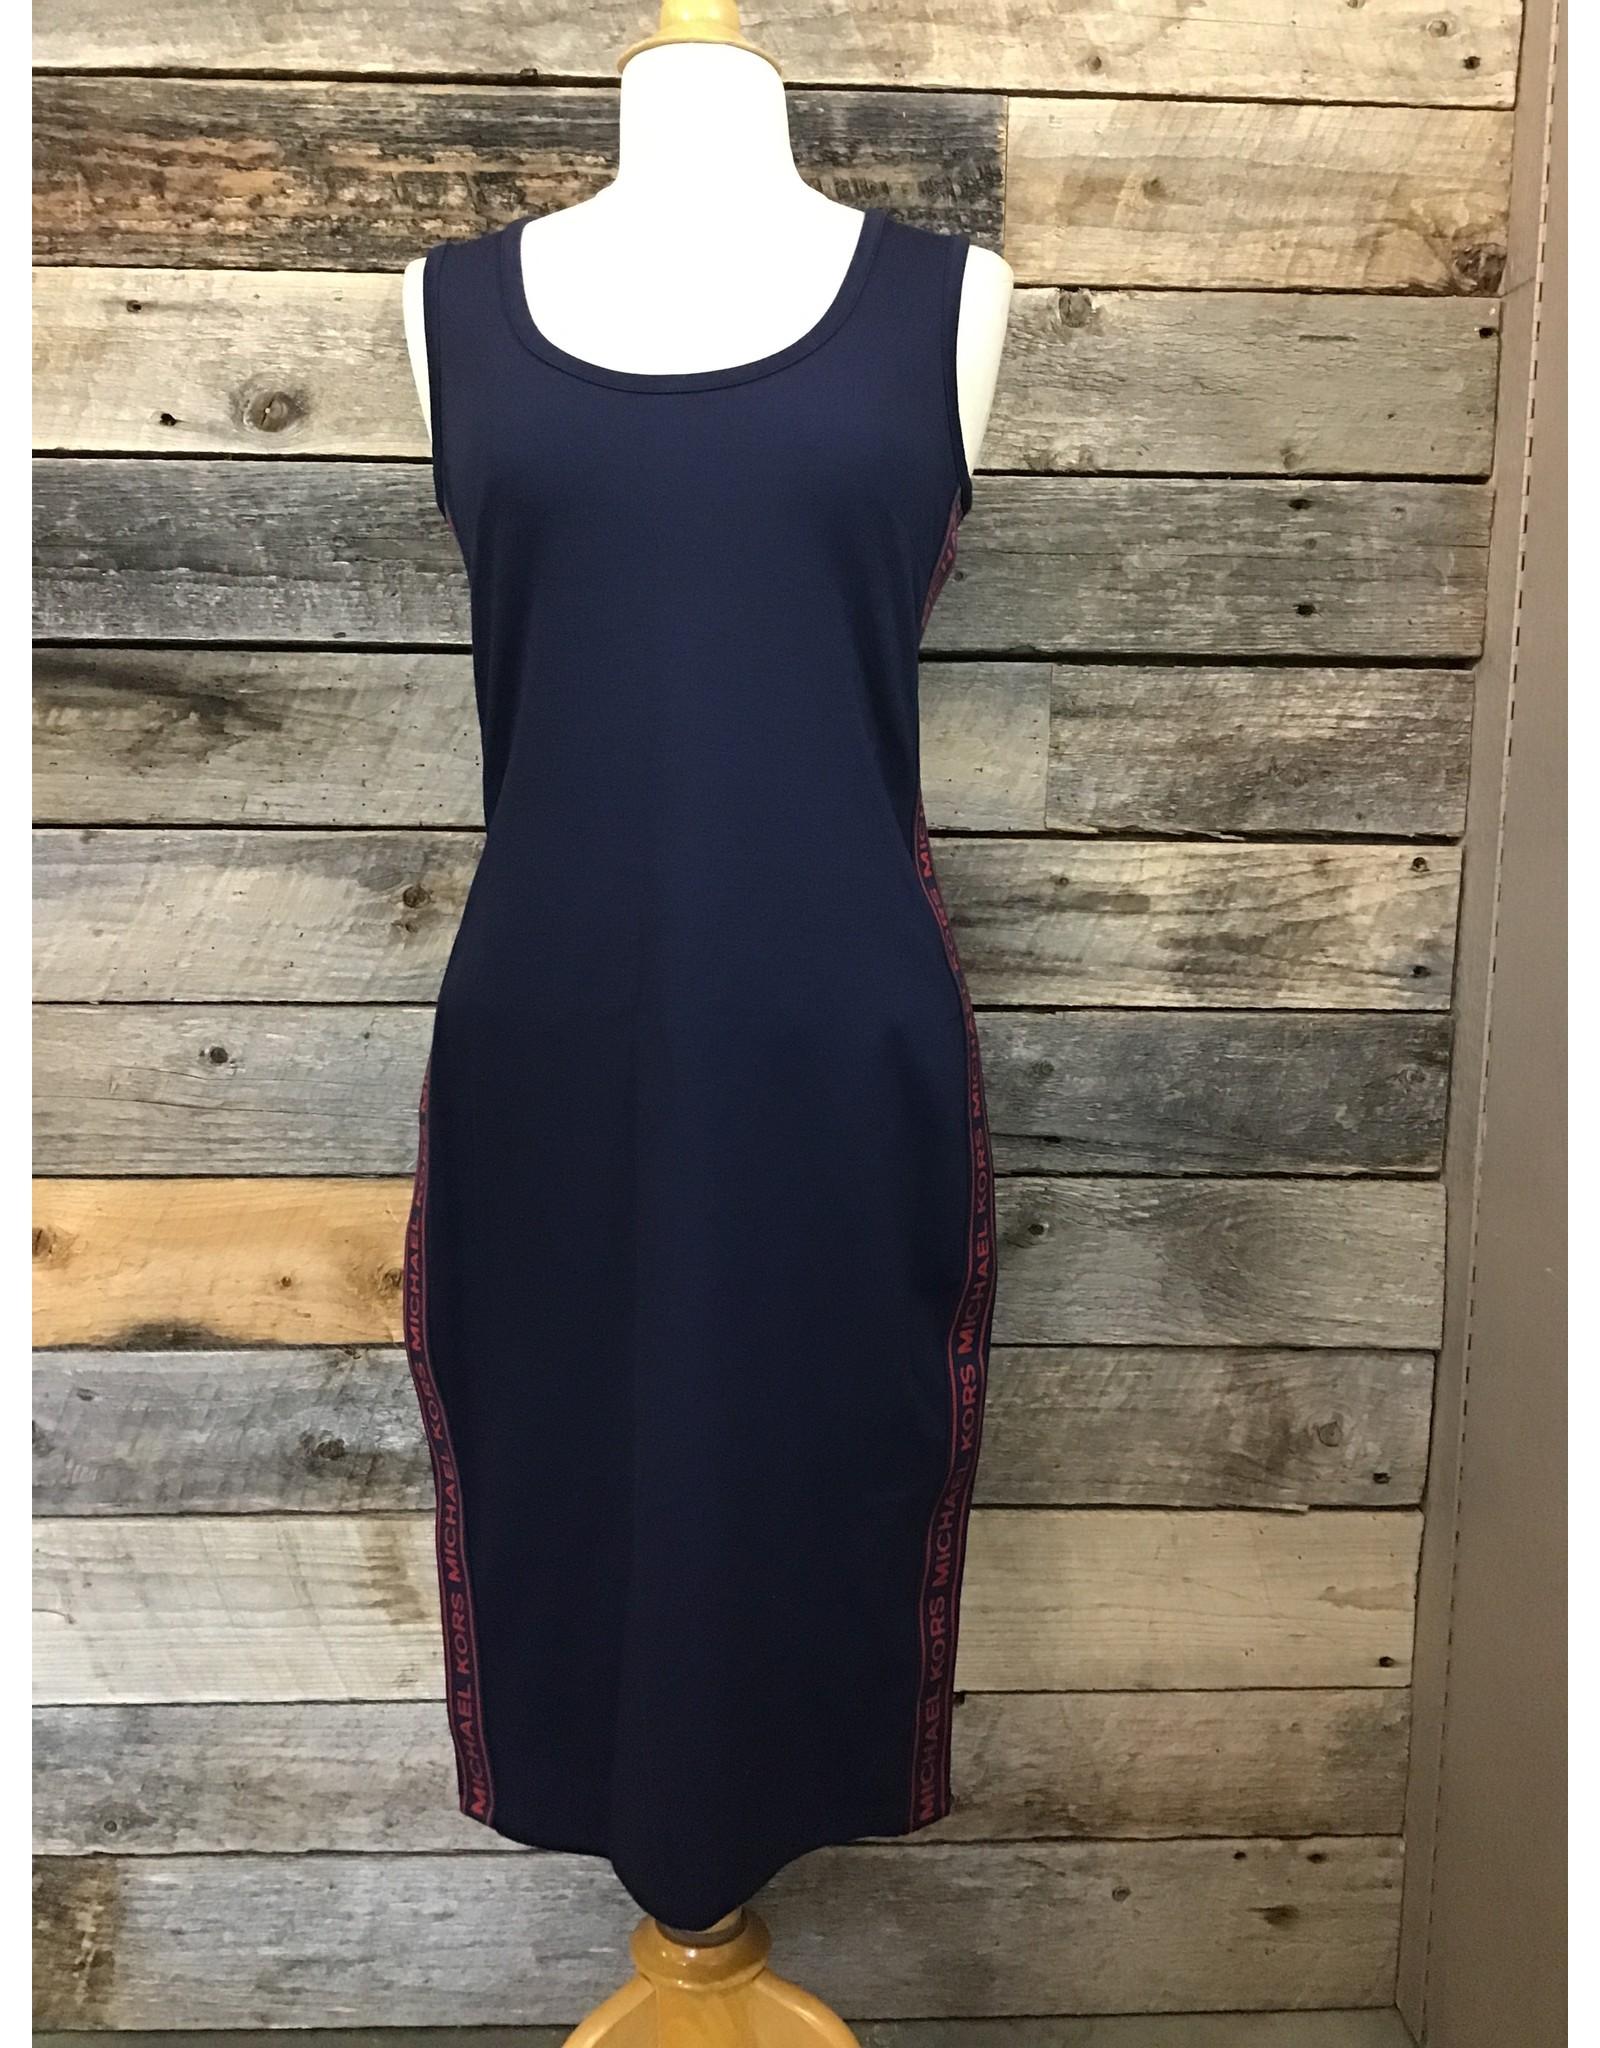 Michael Kors Dress, Logo Navy/Red